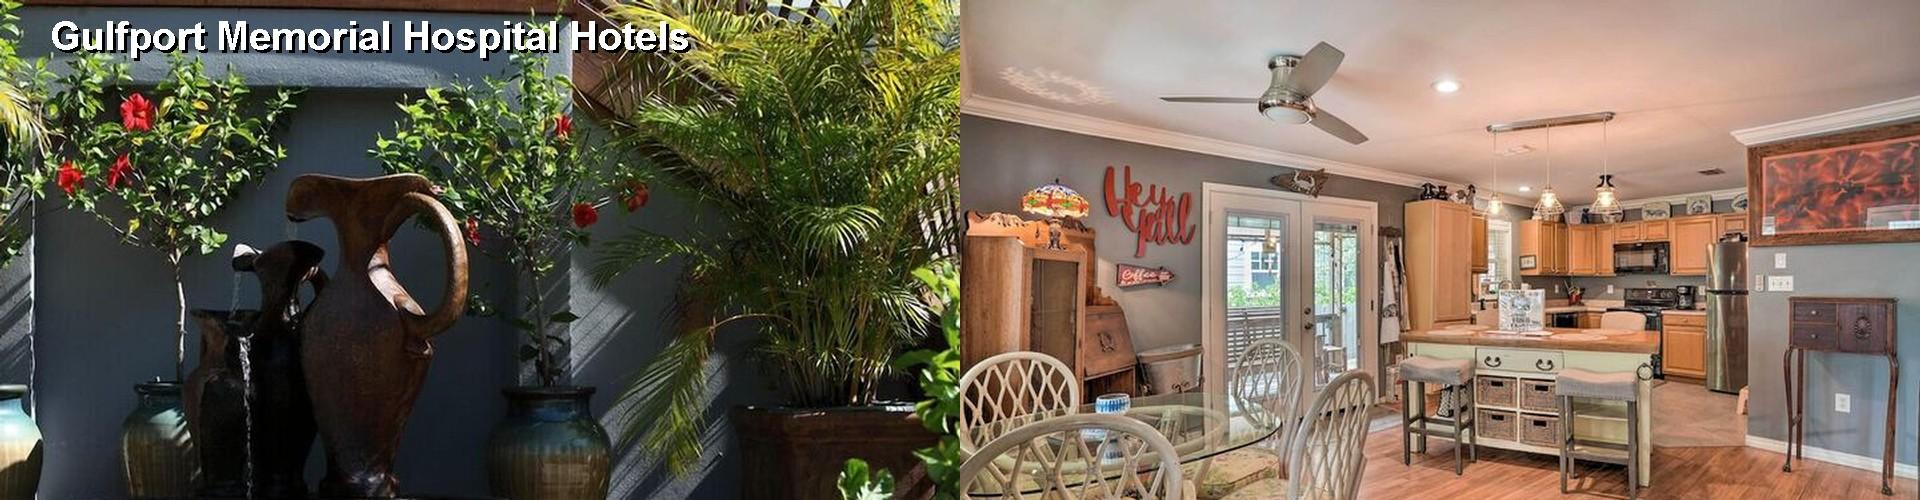 5 Best Hotels Near Gulfport Memorial Hospital